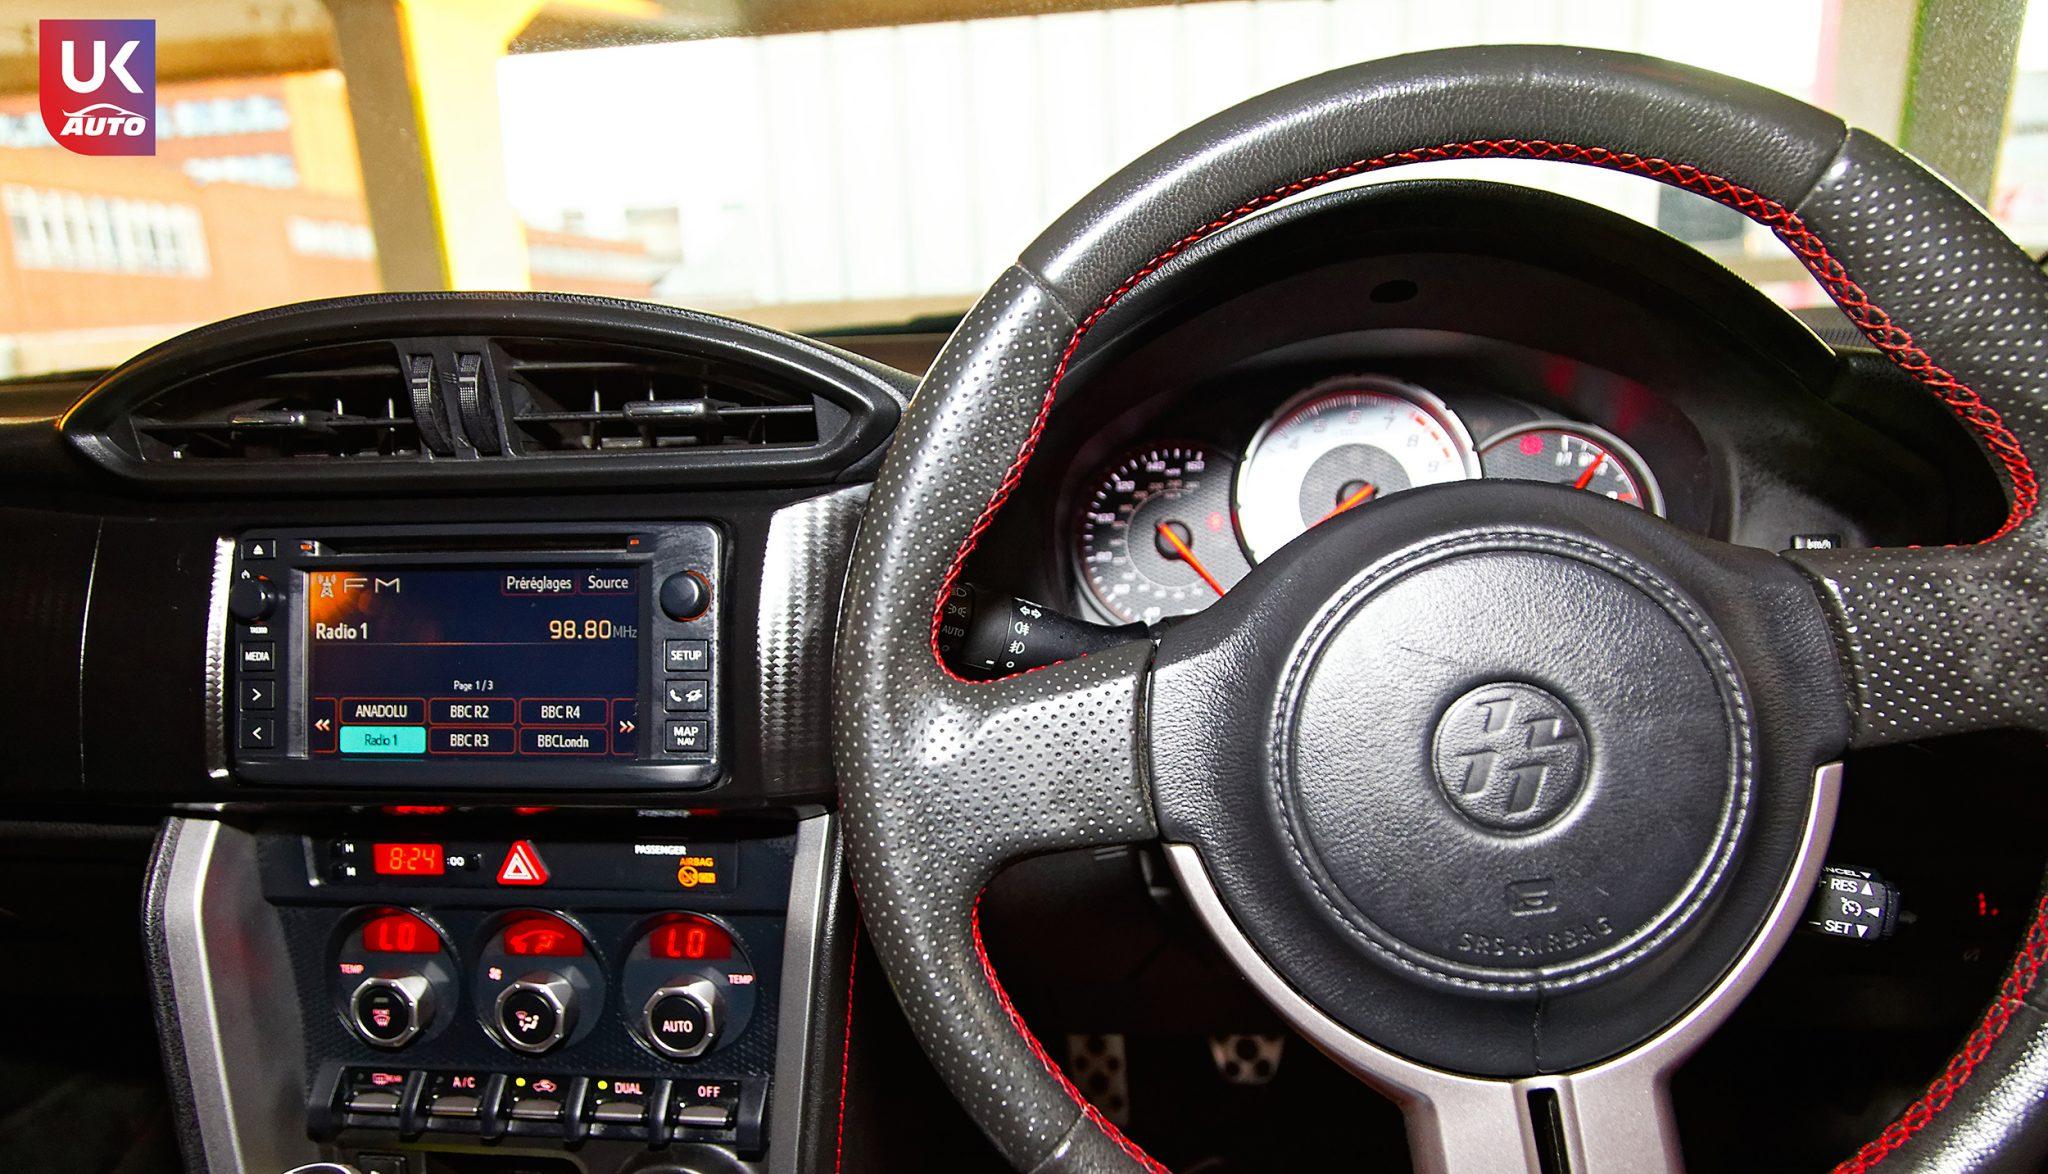 toyota gt86 uk rhd toyota angleterre toyota import mandataire uk auto achat auto7 - Felicitation a Tommy Import Magnifique Toyota GT86 par ukauto votre site occasion uk